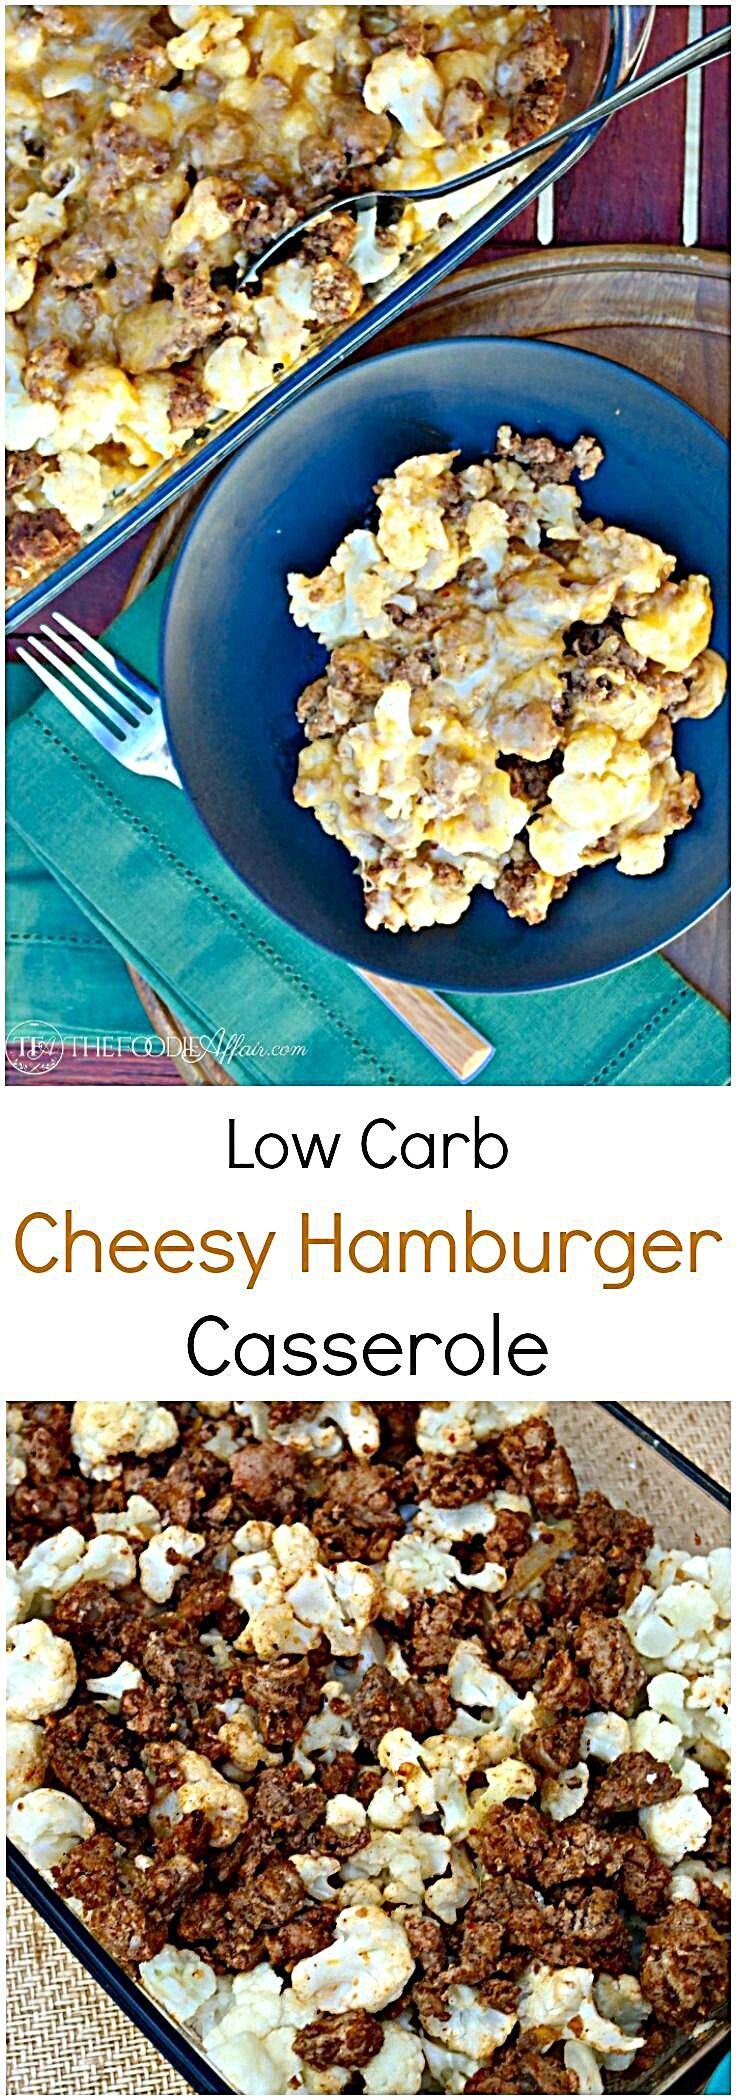 Low Carb Hamburger Casserole #hamburgercassarole